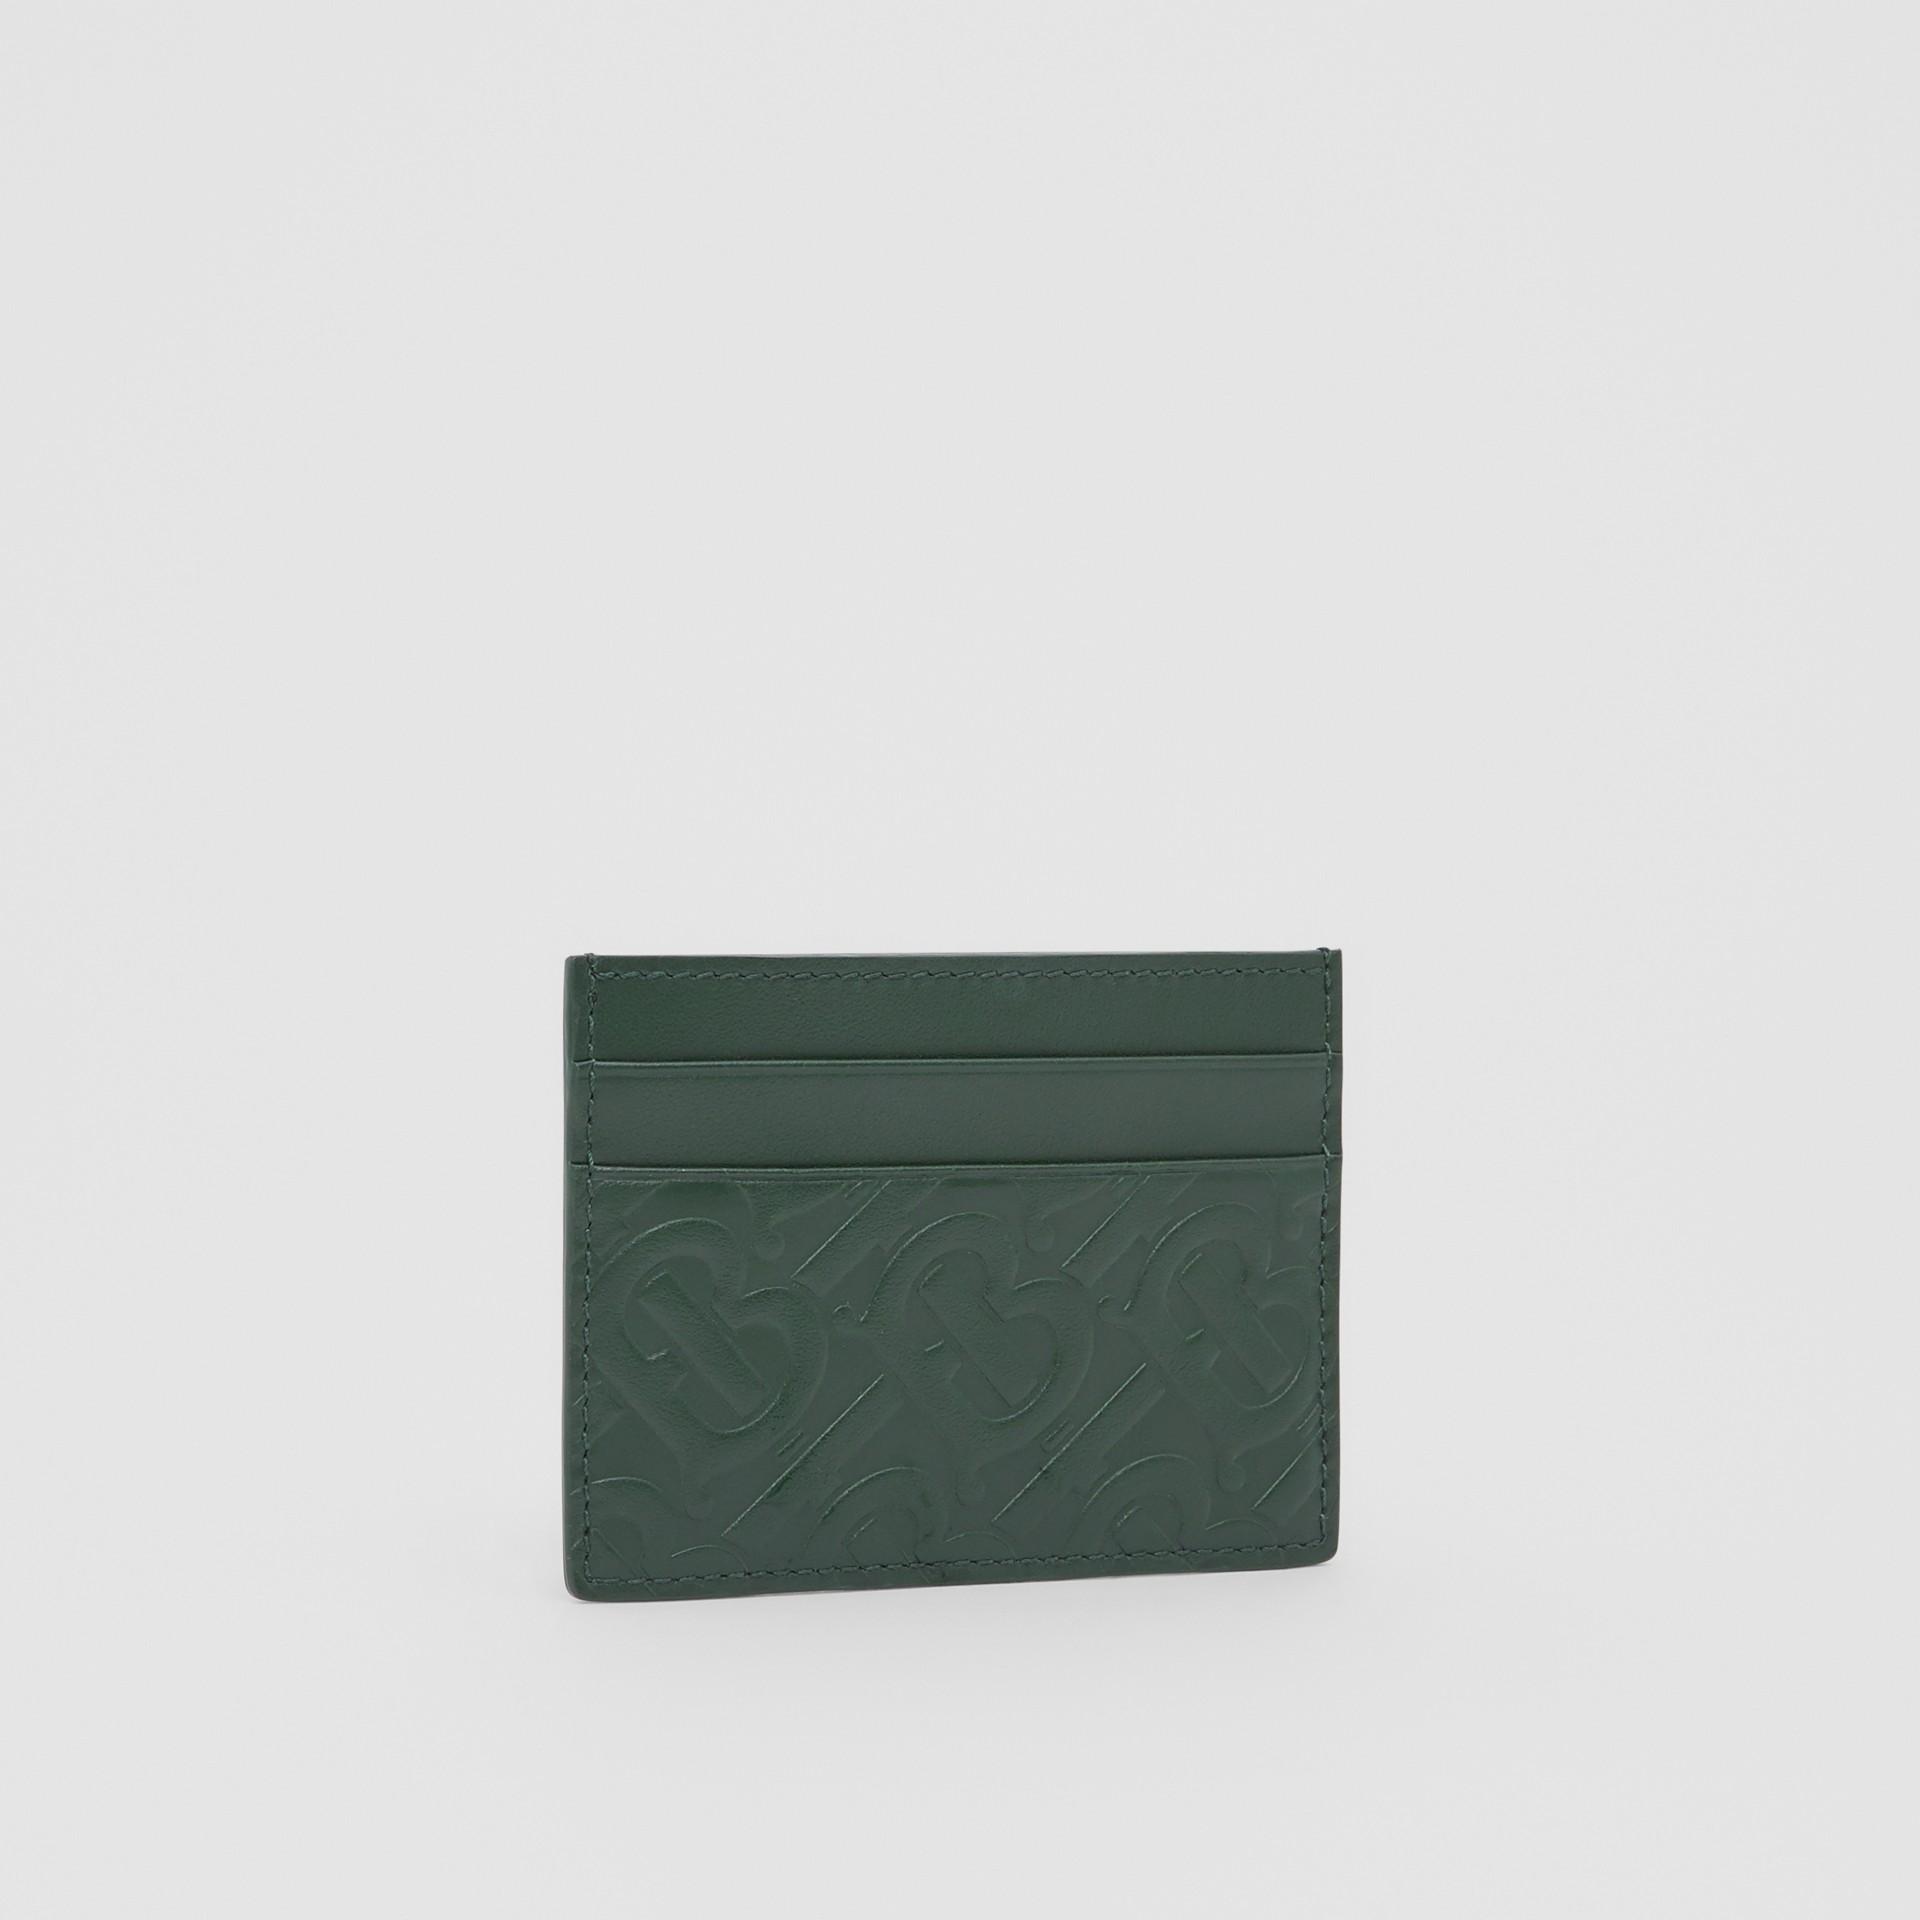 Monogram Leather Card Case in Dark Pine Green - Men   Burberry United Kingdom - gallery image 3